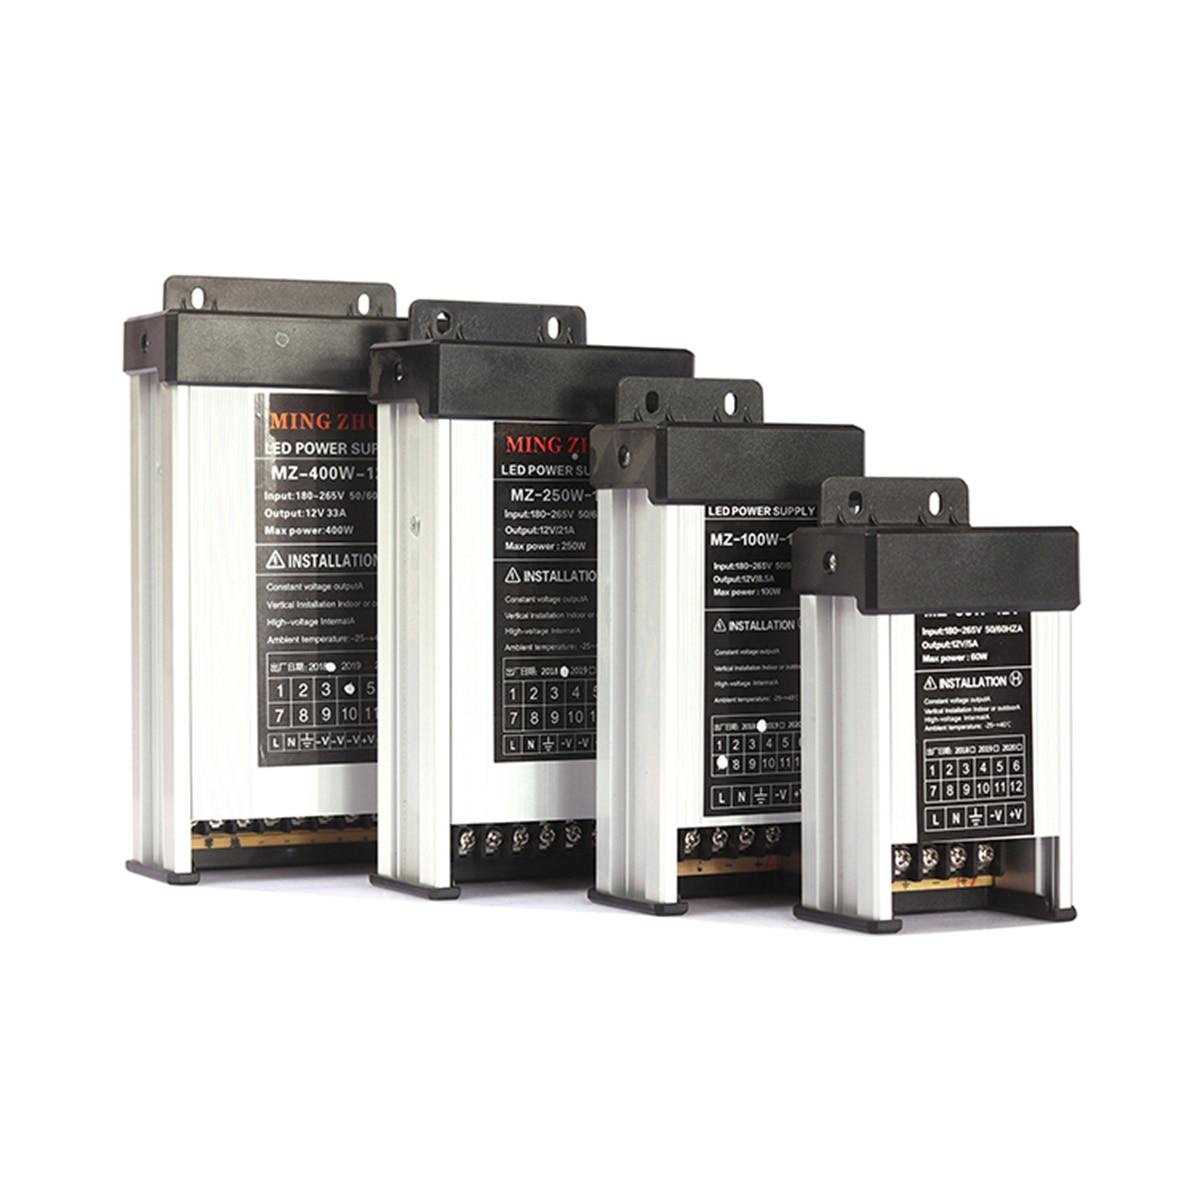 MZ-60/100/250/400W interruptor impermeable fuente de alimentación 380v ac a 220v dc 12v/24V marca SHINIU orferta de fábrica gama completa a bajo precio